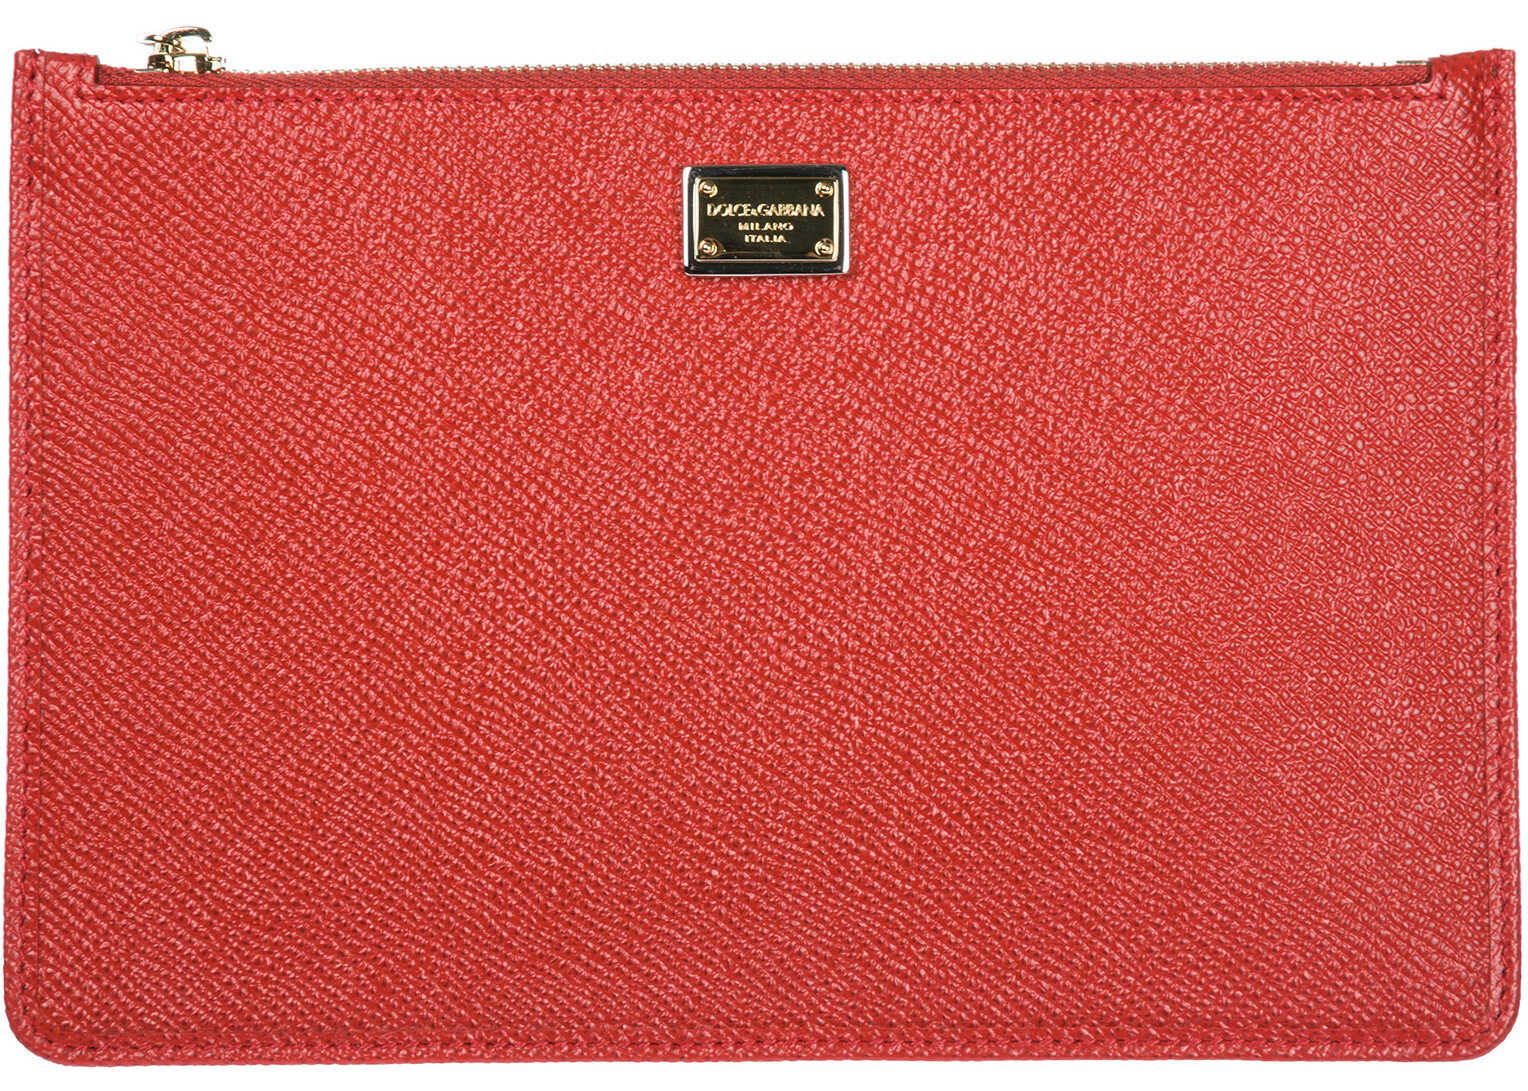 Dolce & Gabbana In Pelle Red